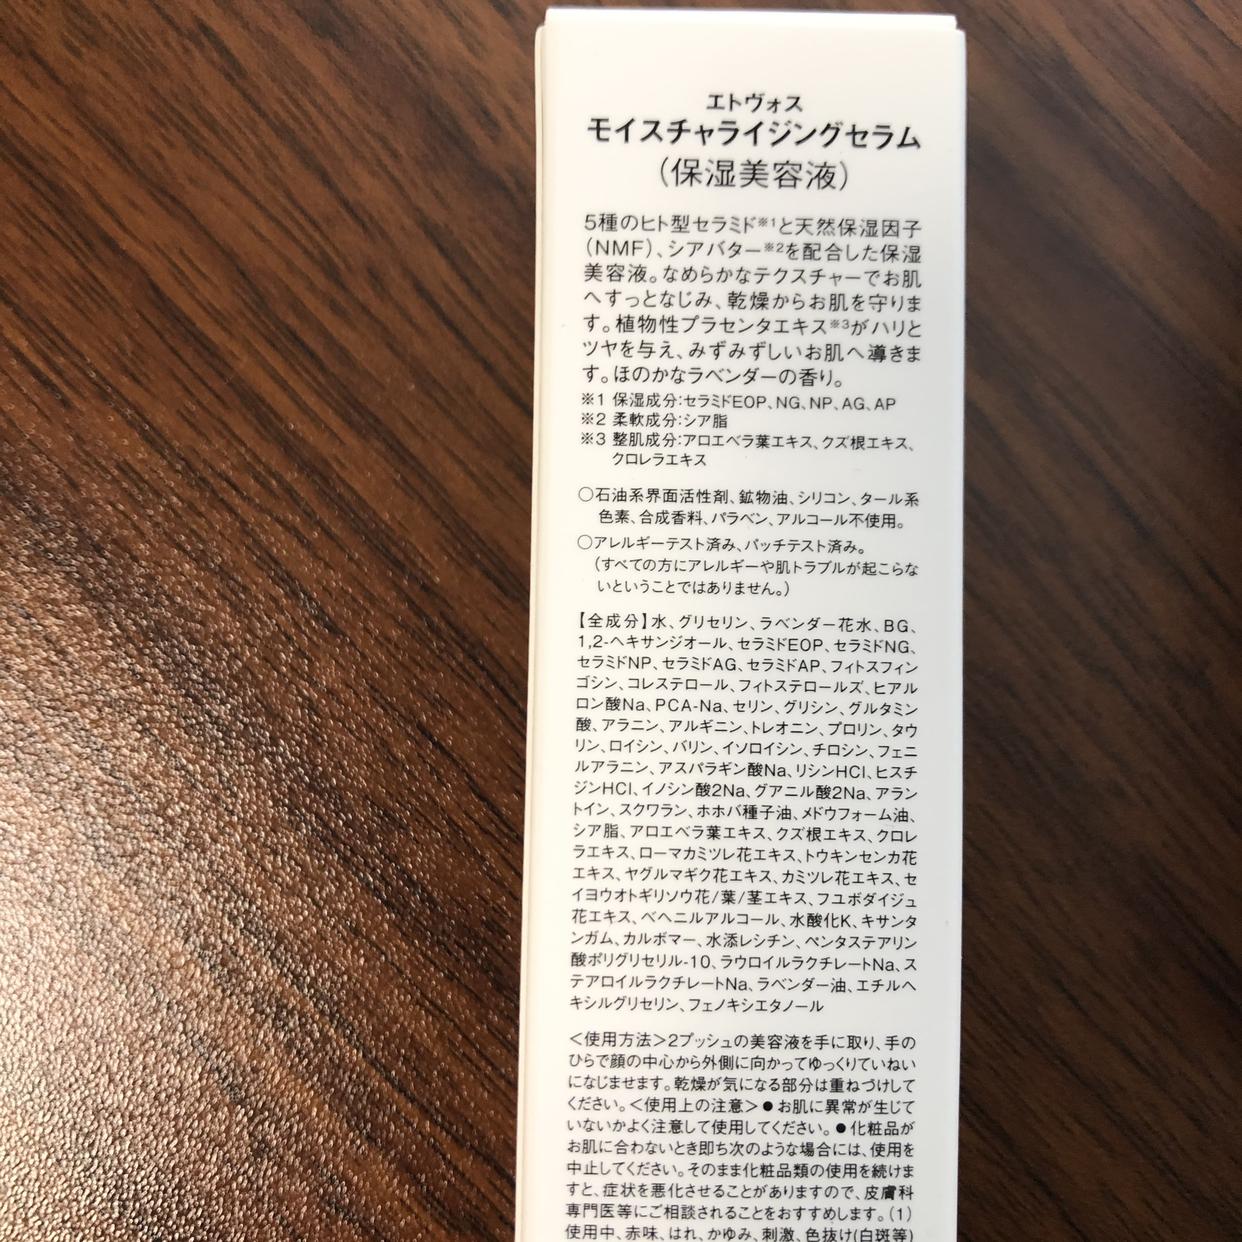 ETVOS(エトヴォス) モイスチャライジングセラムを使ったsuzukoさんのクチコミ画像2